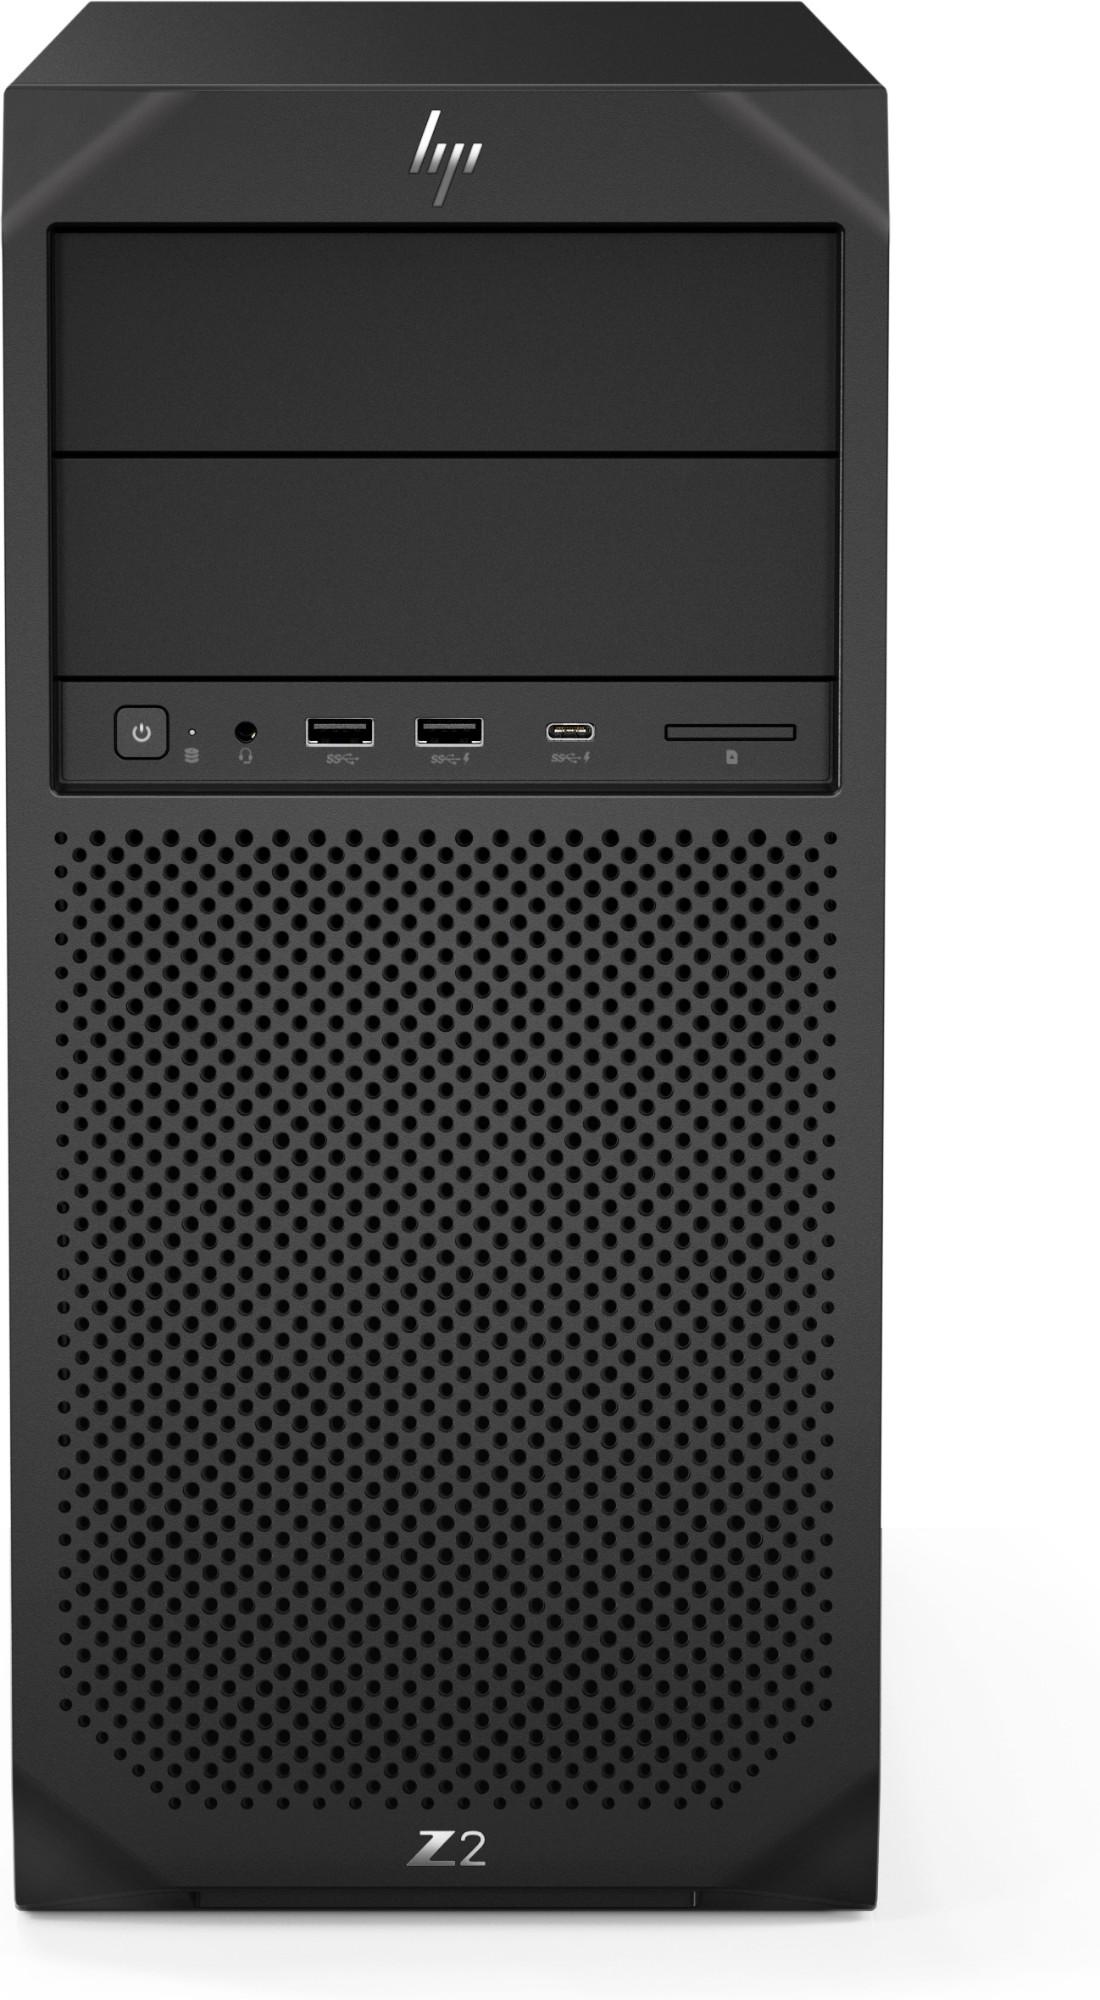 HP Z2 G4 8th gen Intel® Core™ i7 i7-8700K 16 GB DDR4-SDRAM 512 GB SSD Tower Black Workstation Windows 10 Pro